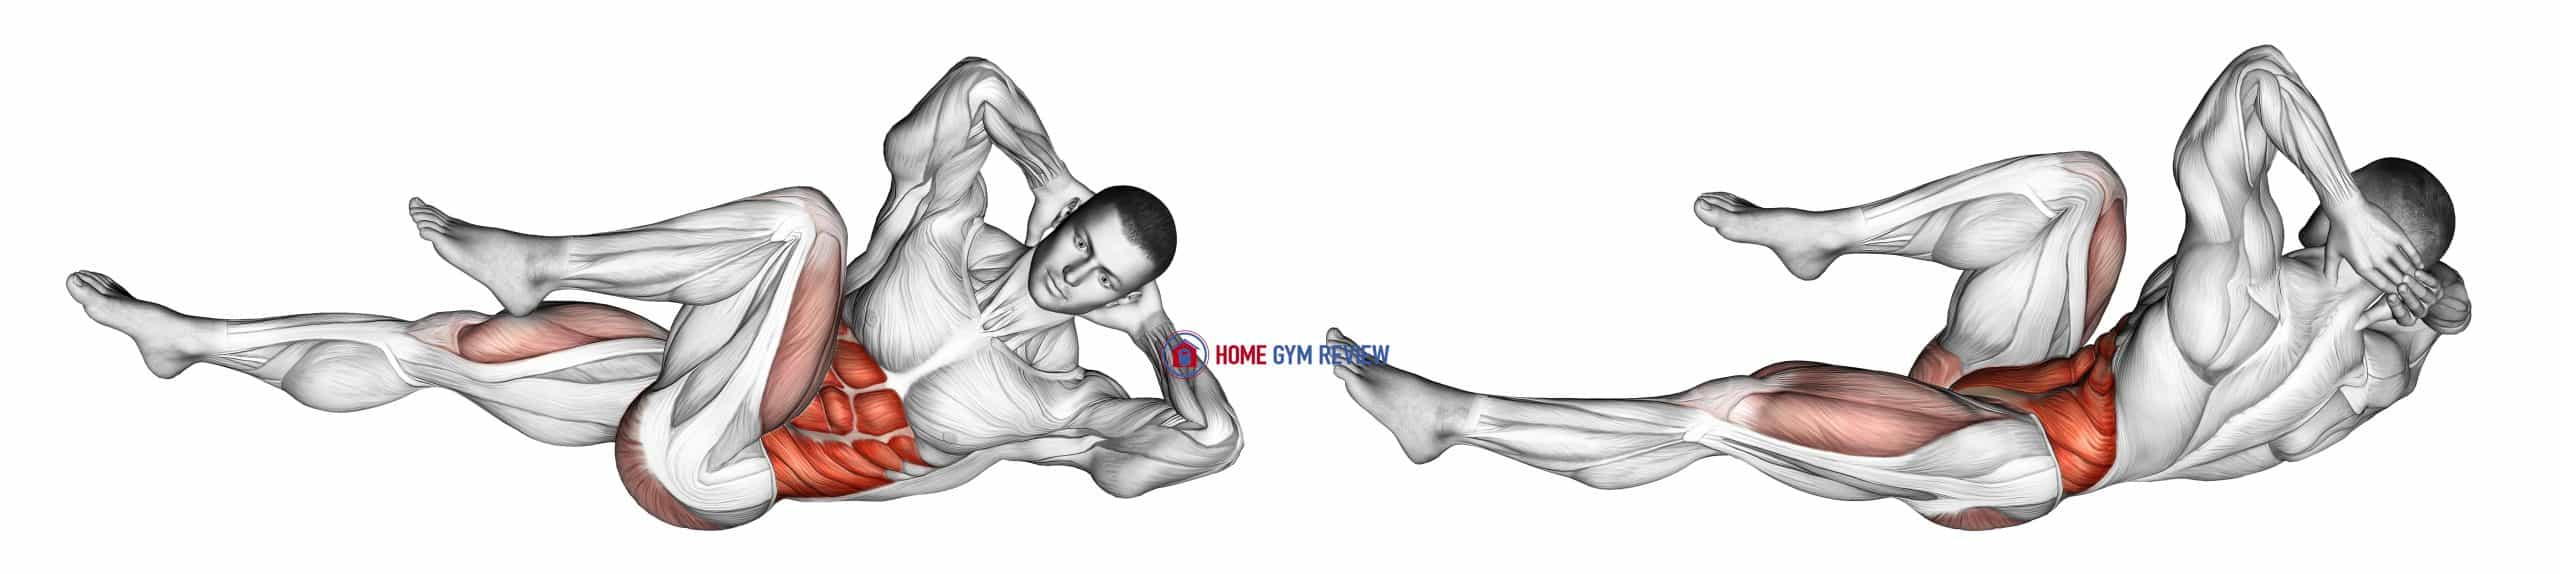 Elbow-To-Knee